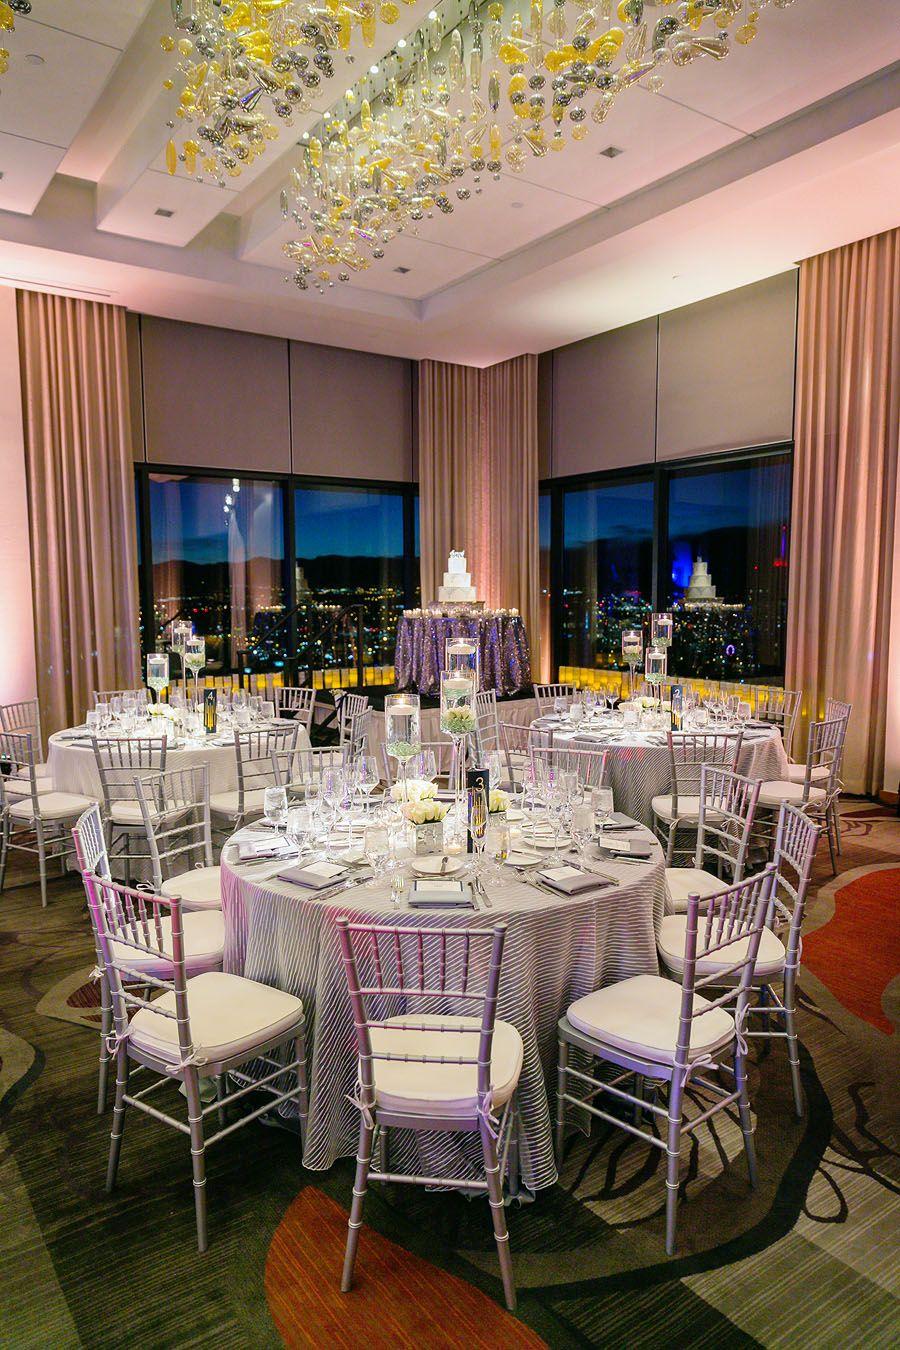 Wedding Reception At The Grand Hyatt Denver Pinnacle Club Example Of Cake In Corner